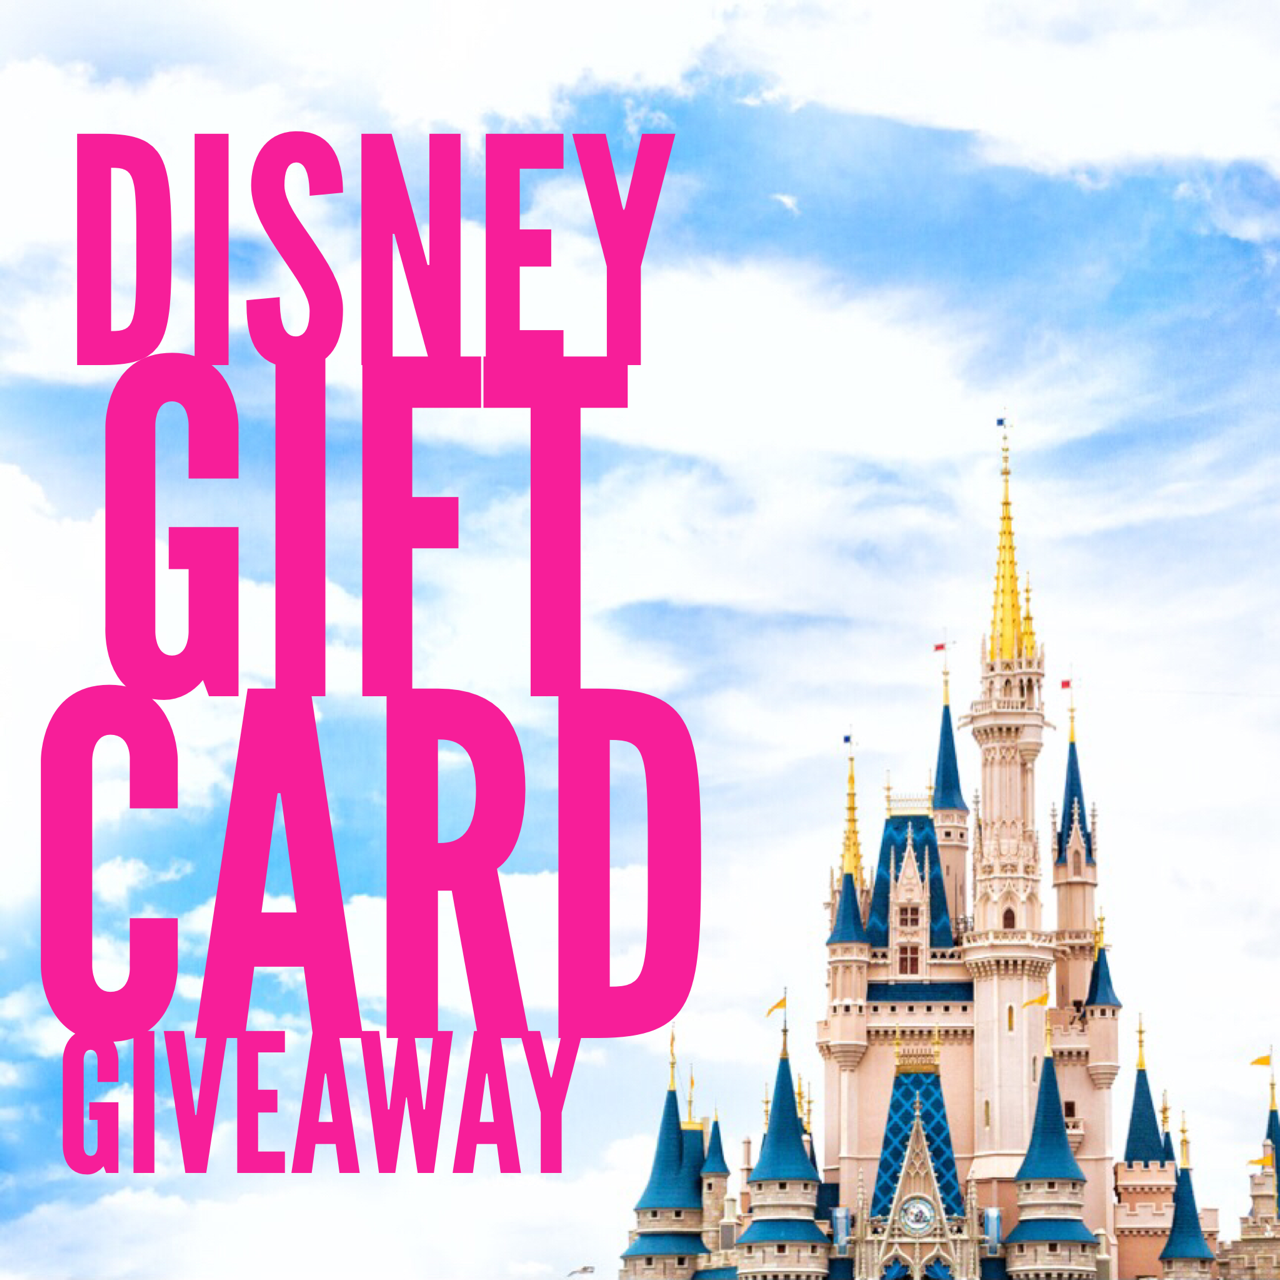 Java John Z's : $250 Disney Gift Card Giveaway